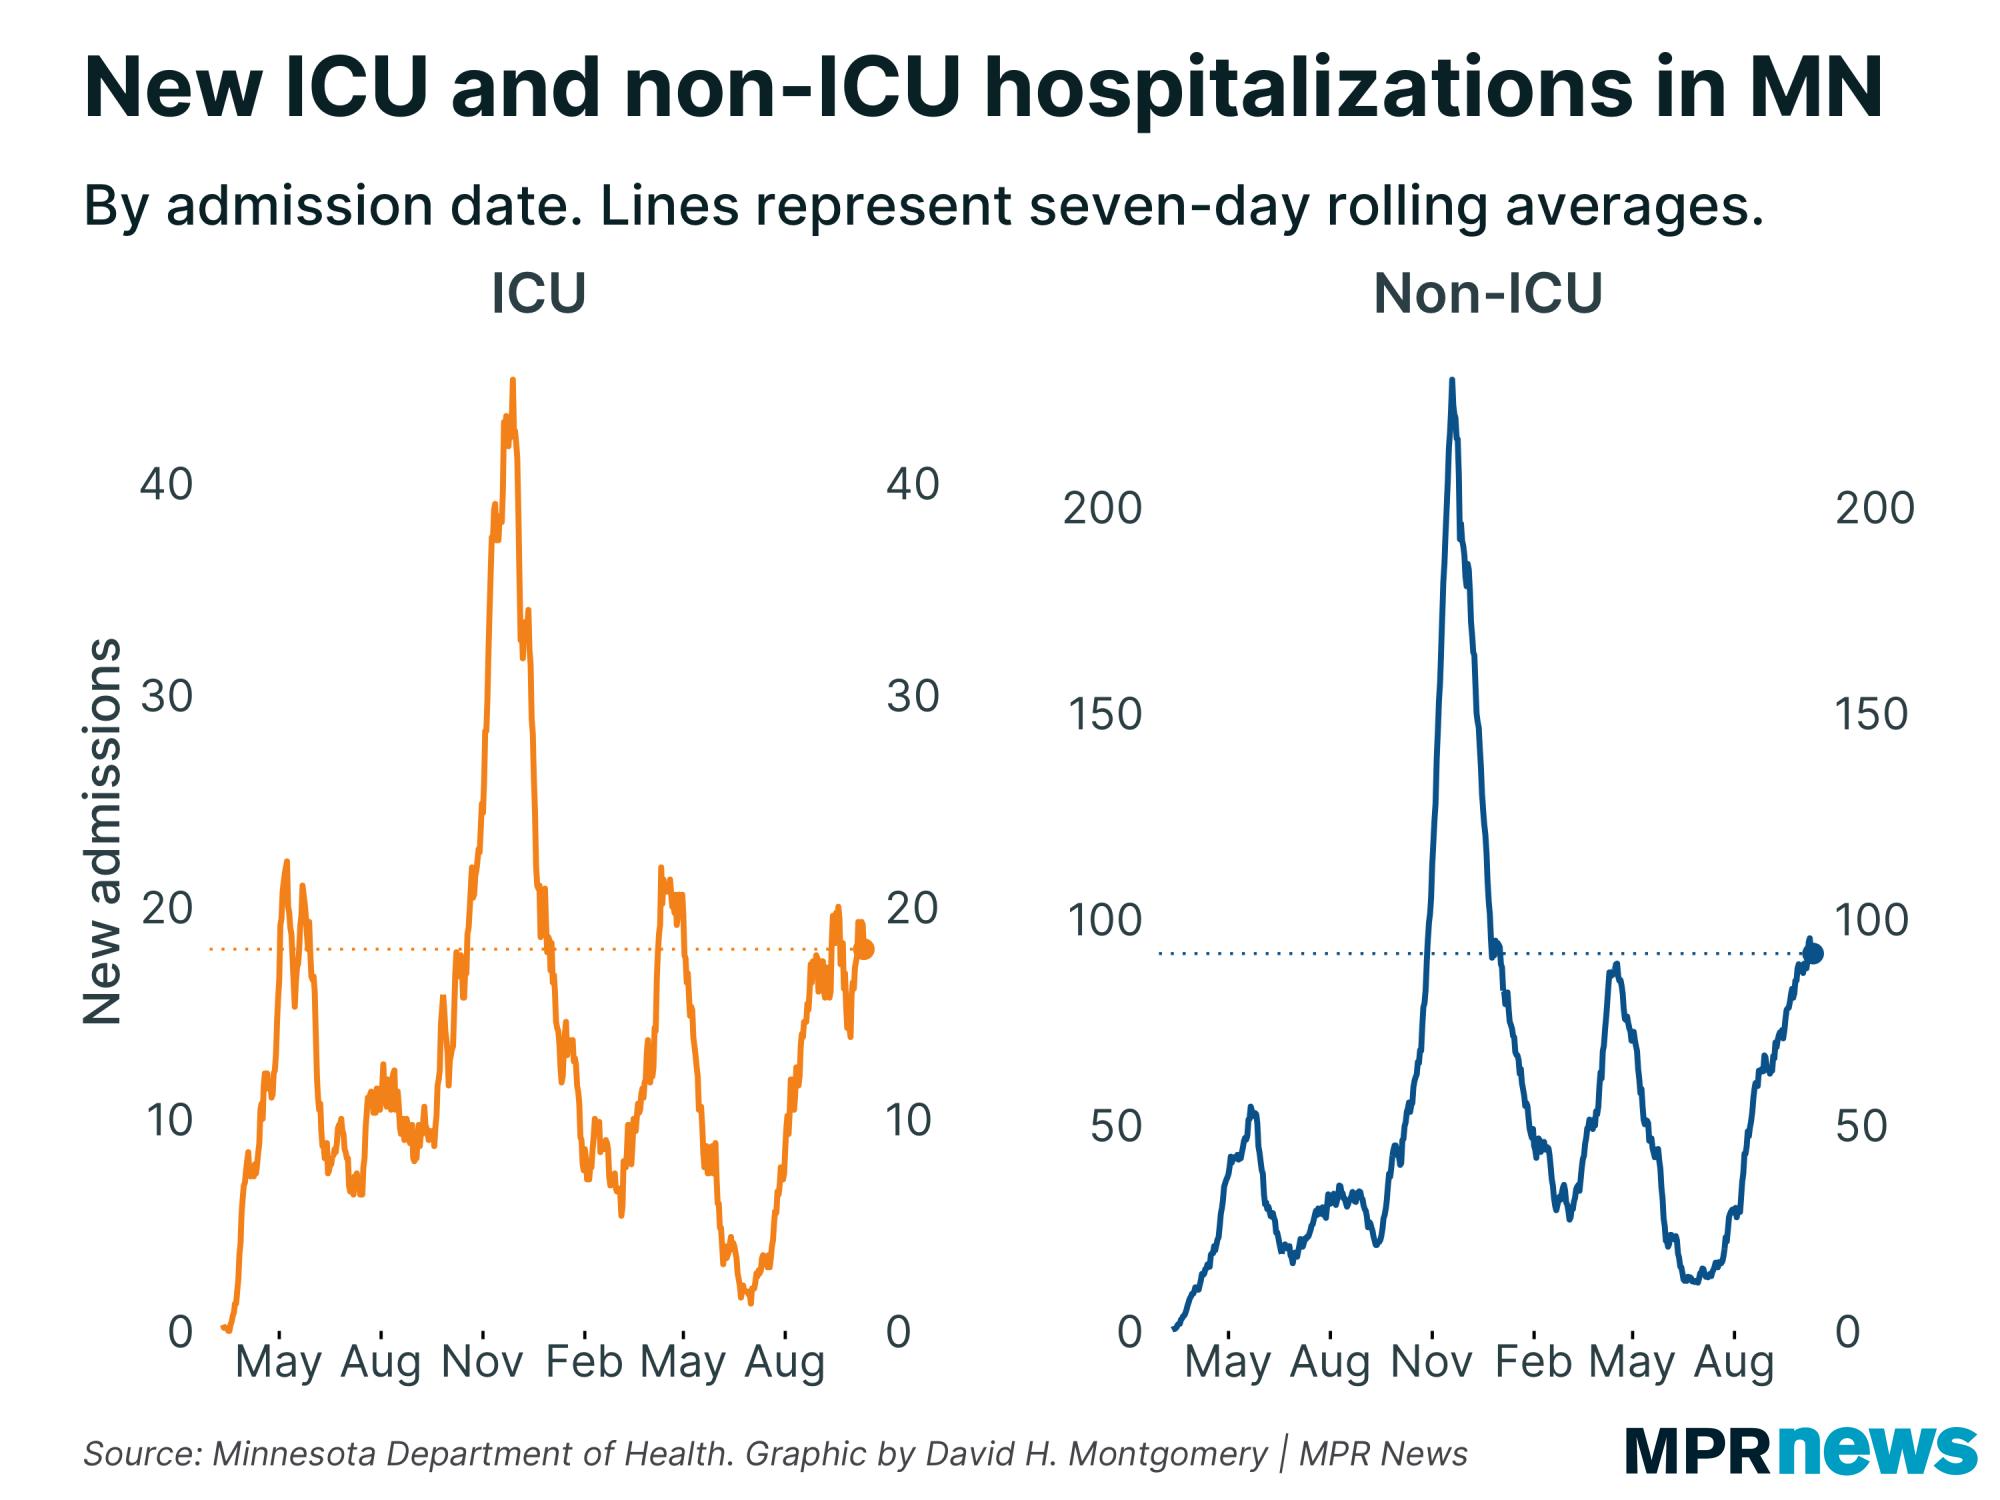 Graph of new ICU and non-ICU COVID-19 hospitalizations